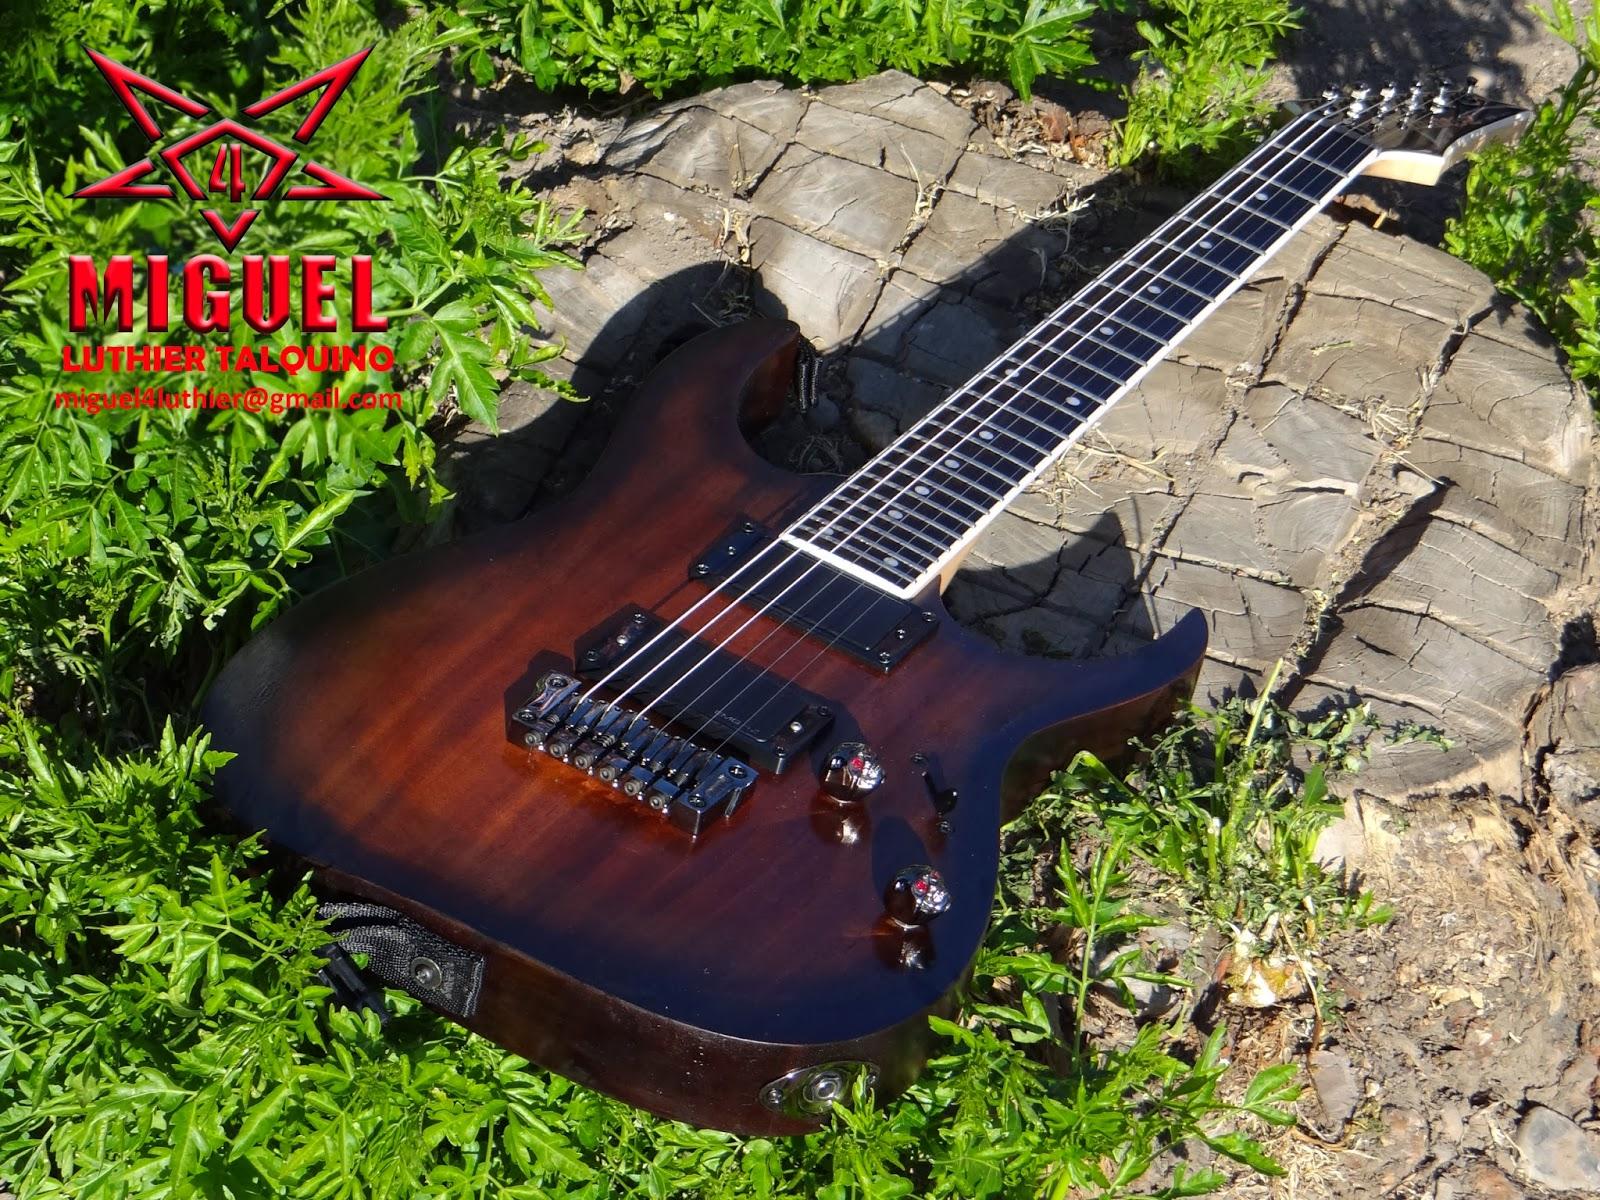 Luthier miguel4 talca guitarra electrica ibanez rg321 for Luthier guitarra electrica